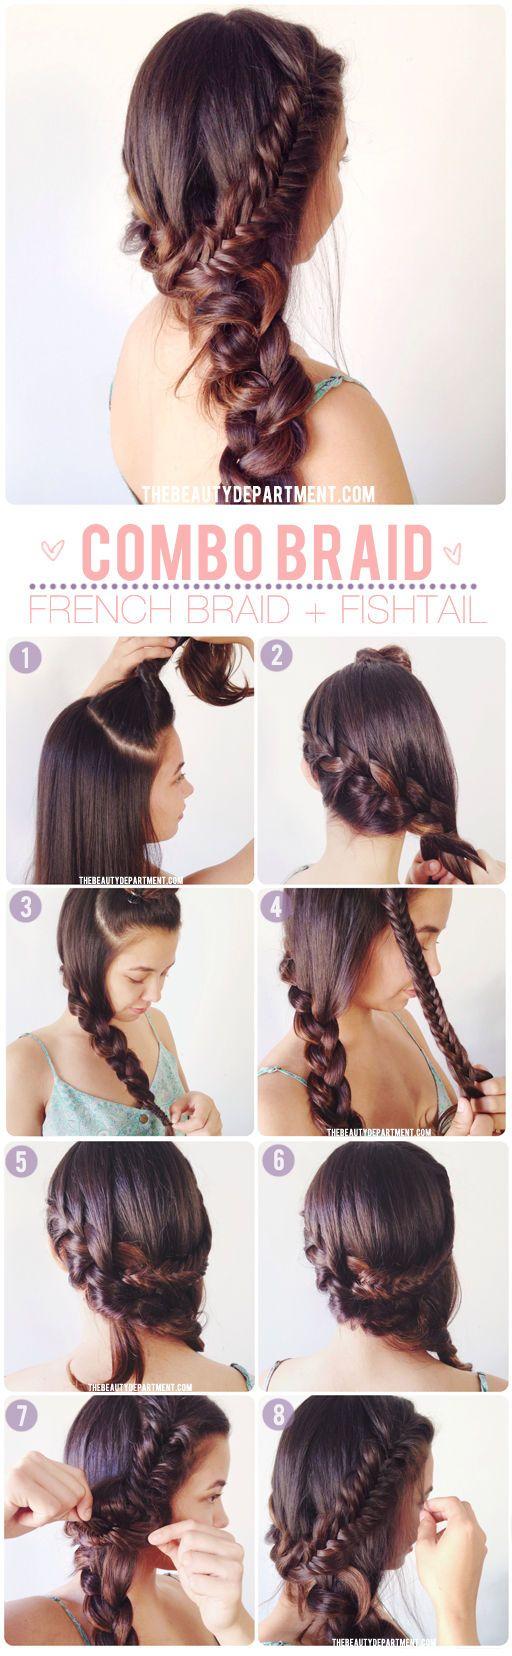 Summer Fishtail Braid Hairstyle Tutorial